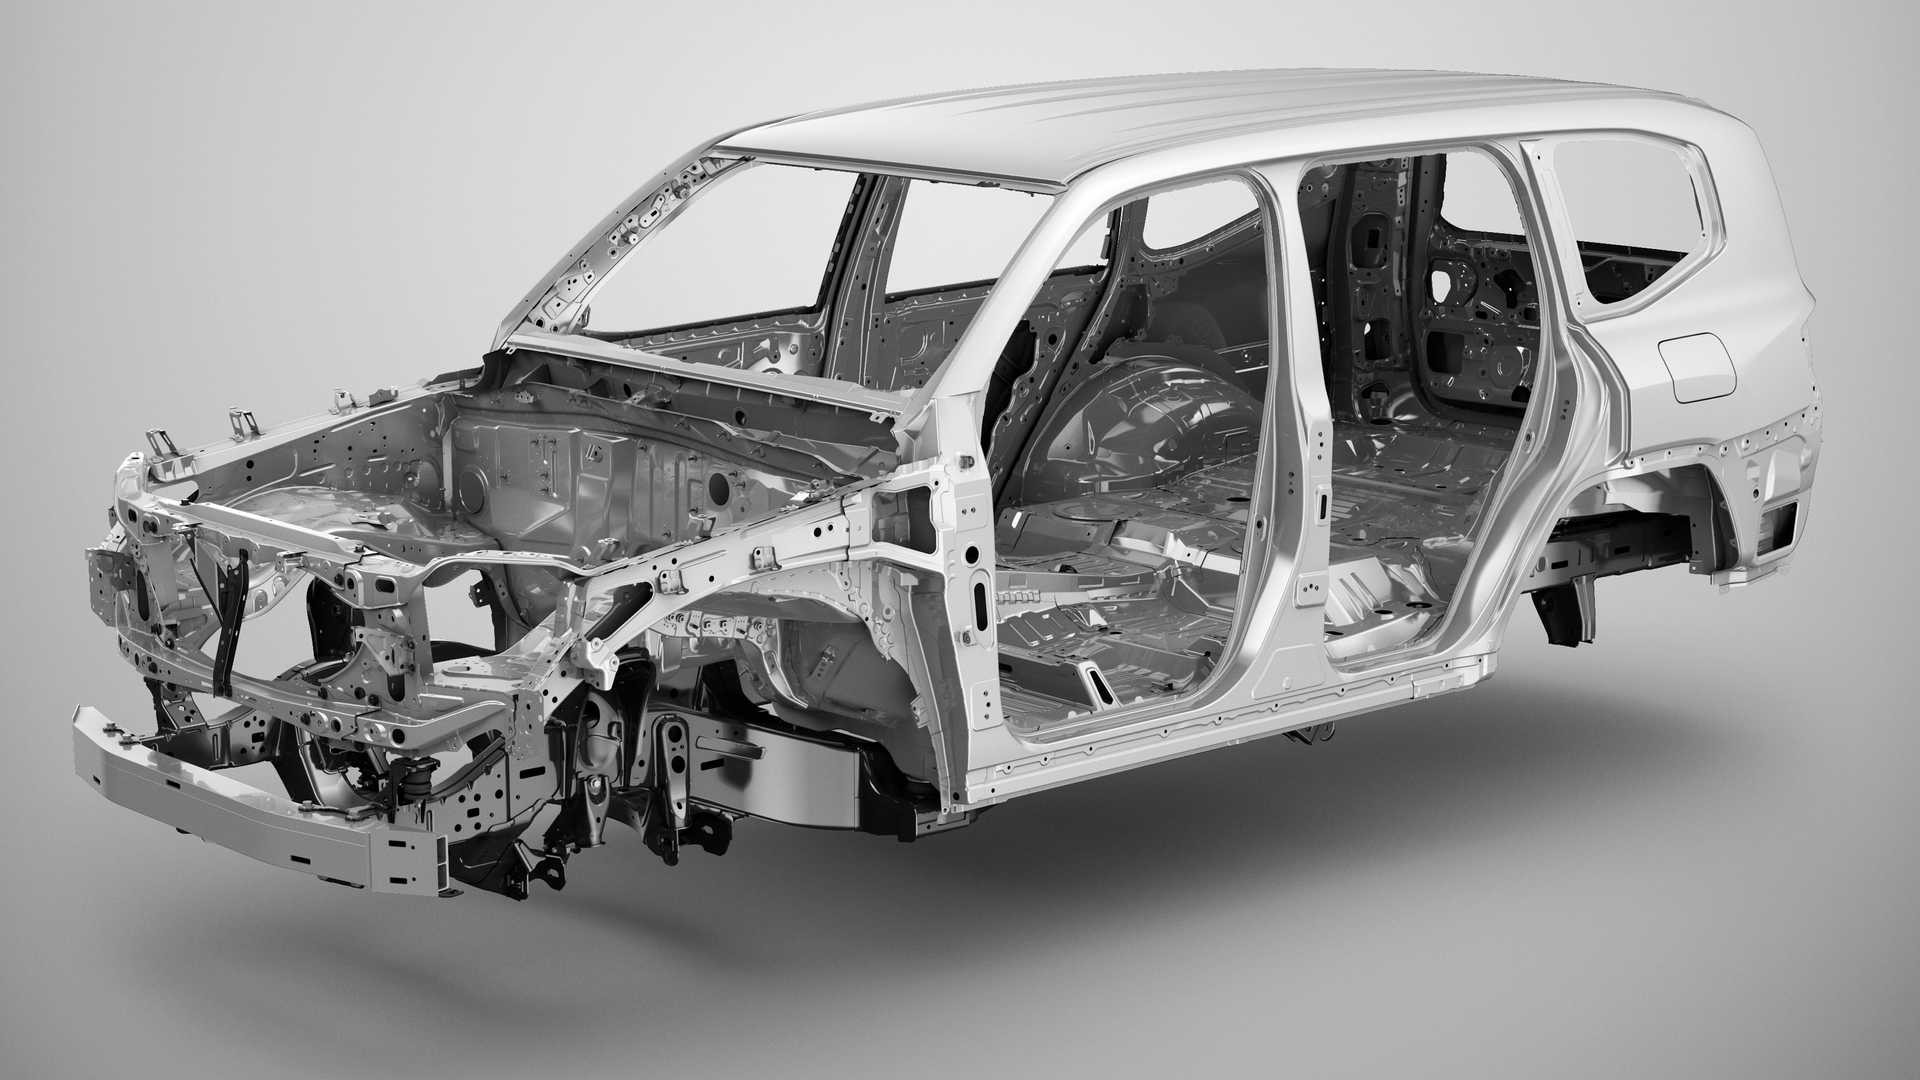 Toyota Land Cruiser 300 2022 (37)